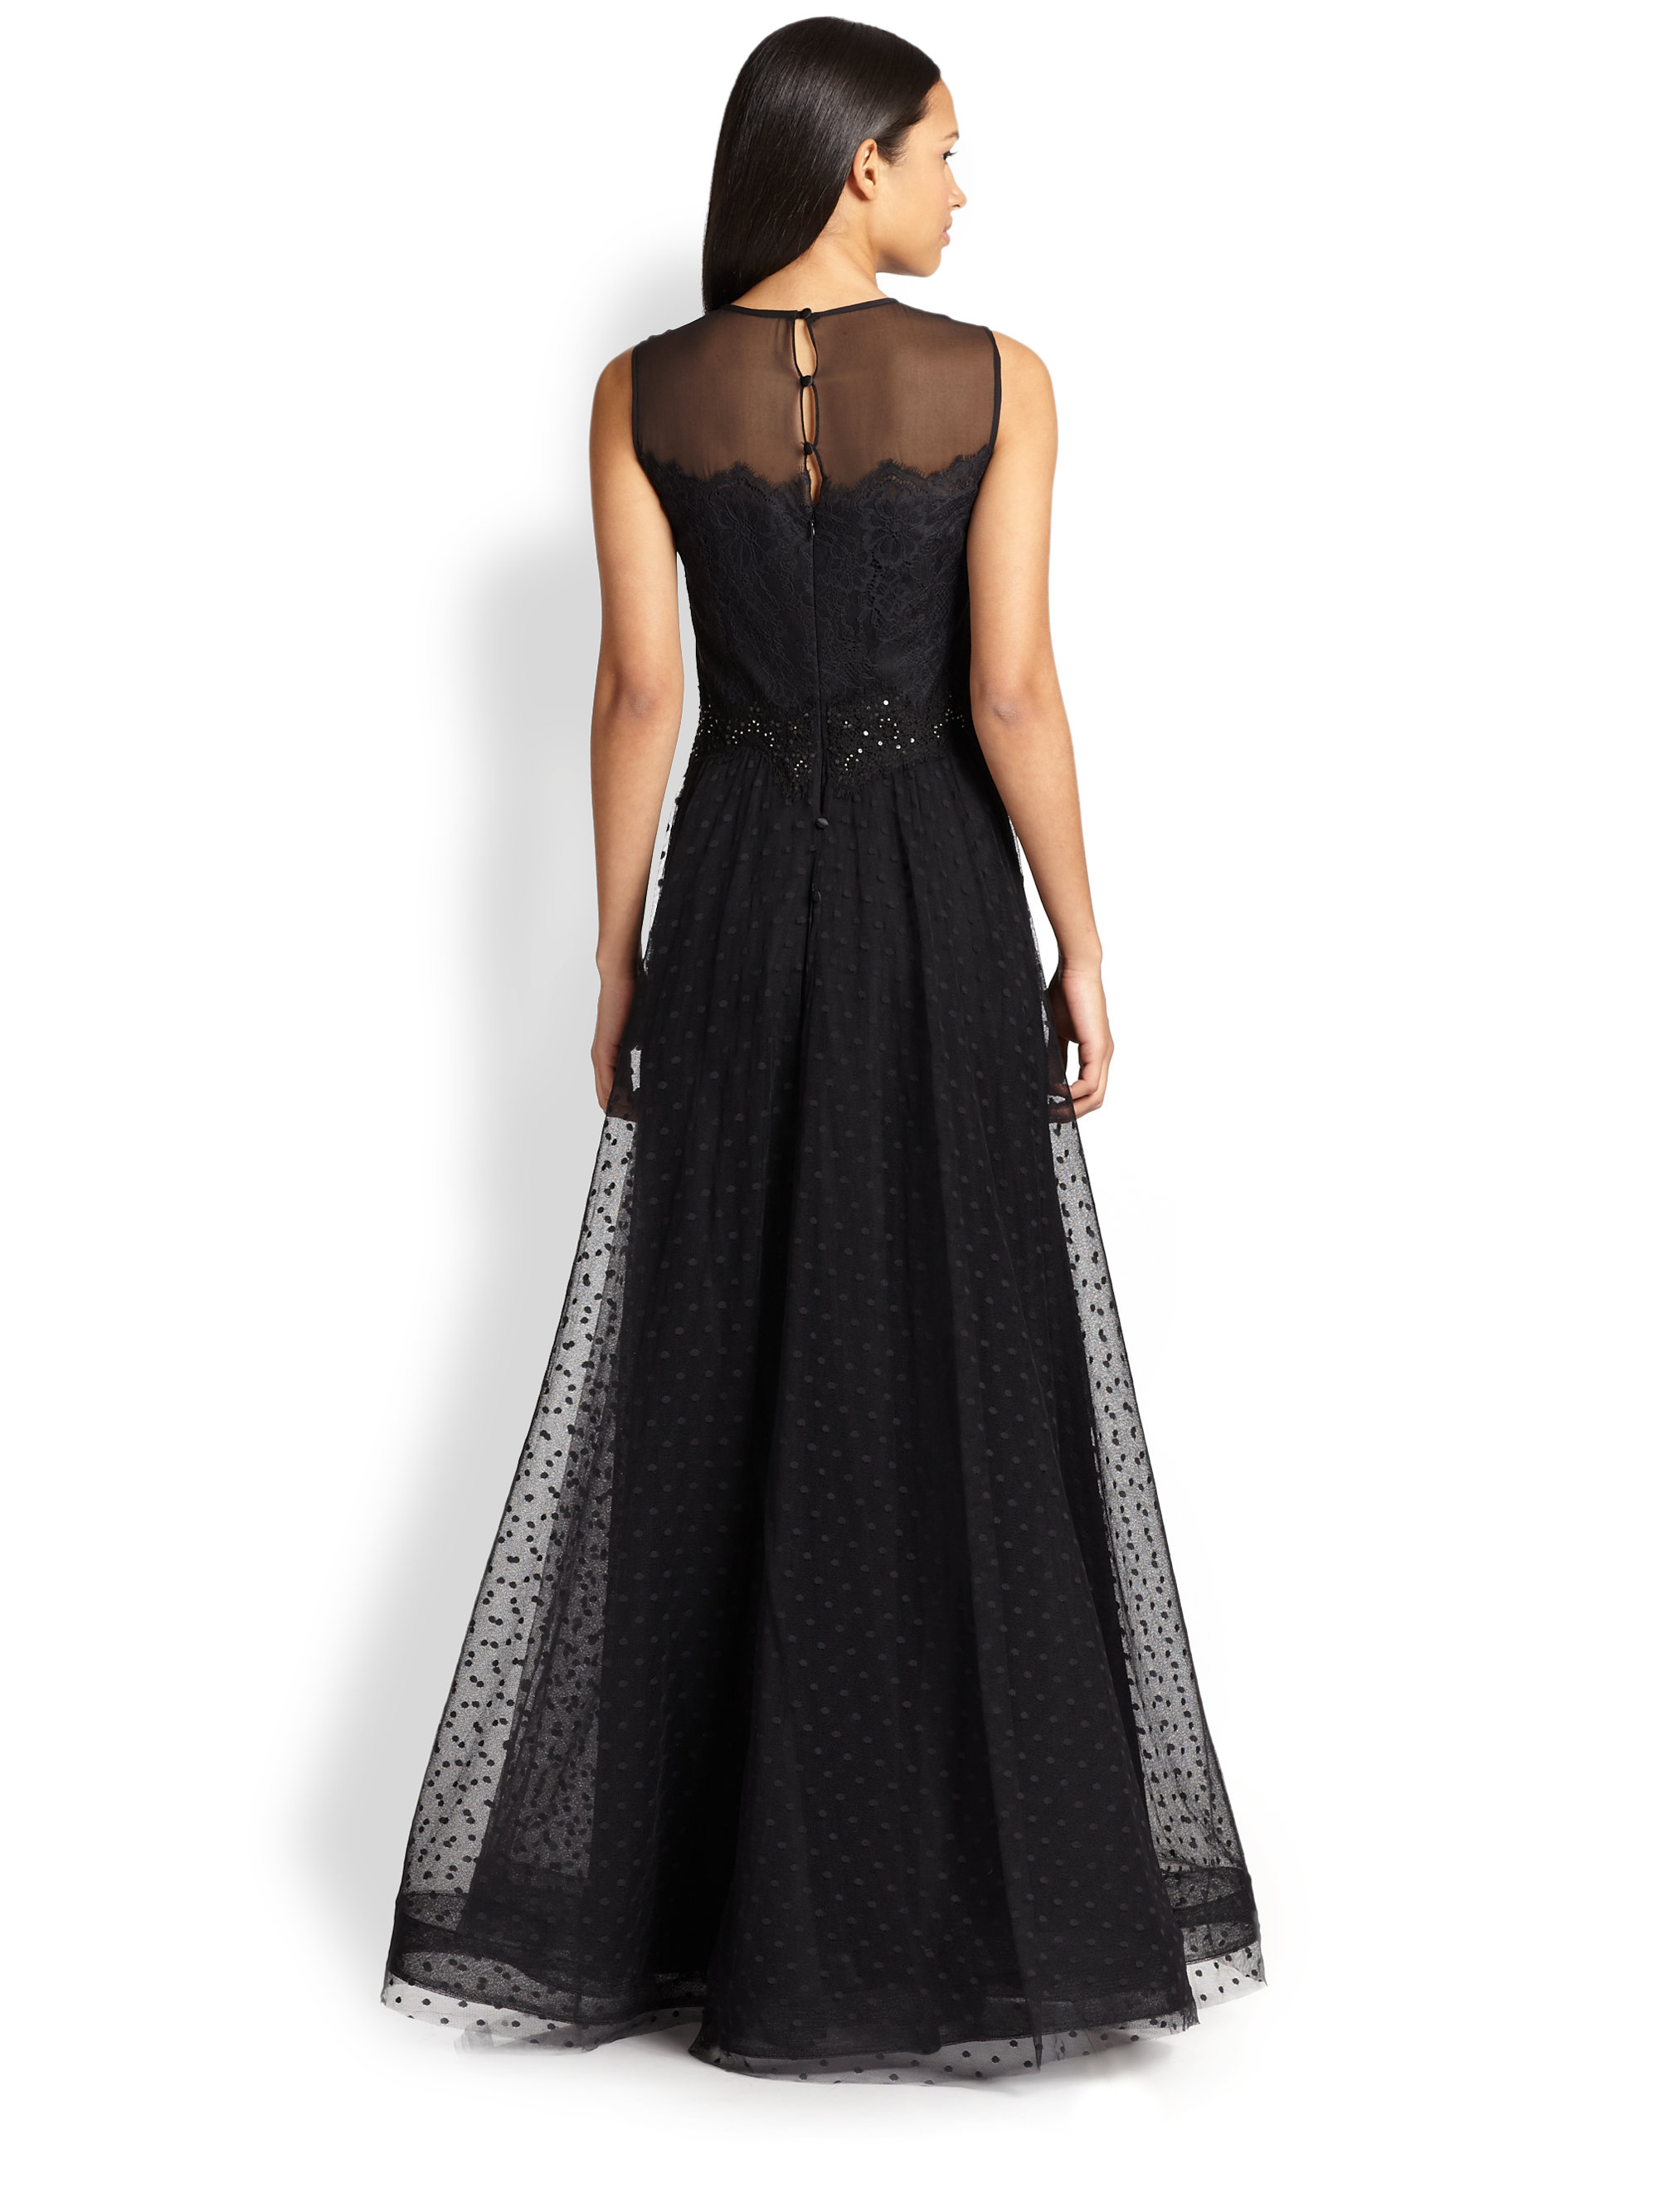 Lyst - Teri Jon Illusion Lace-bodice Gown in Black